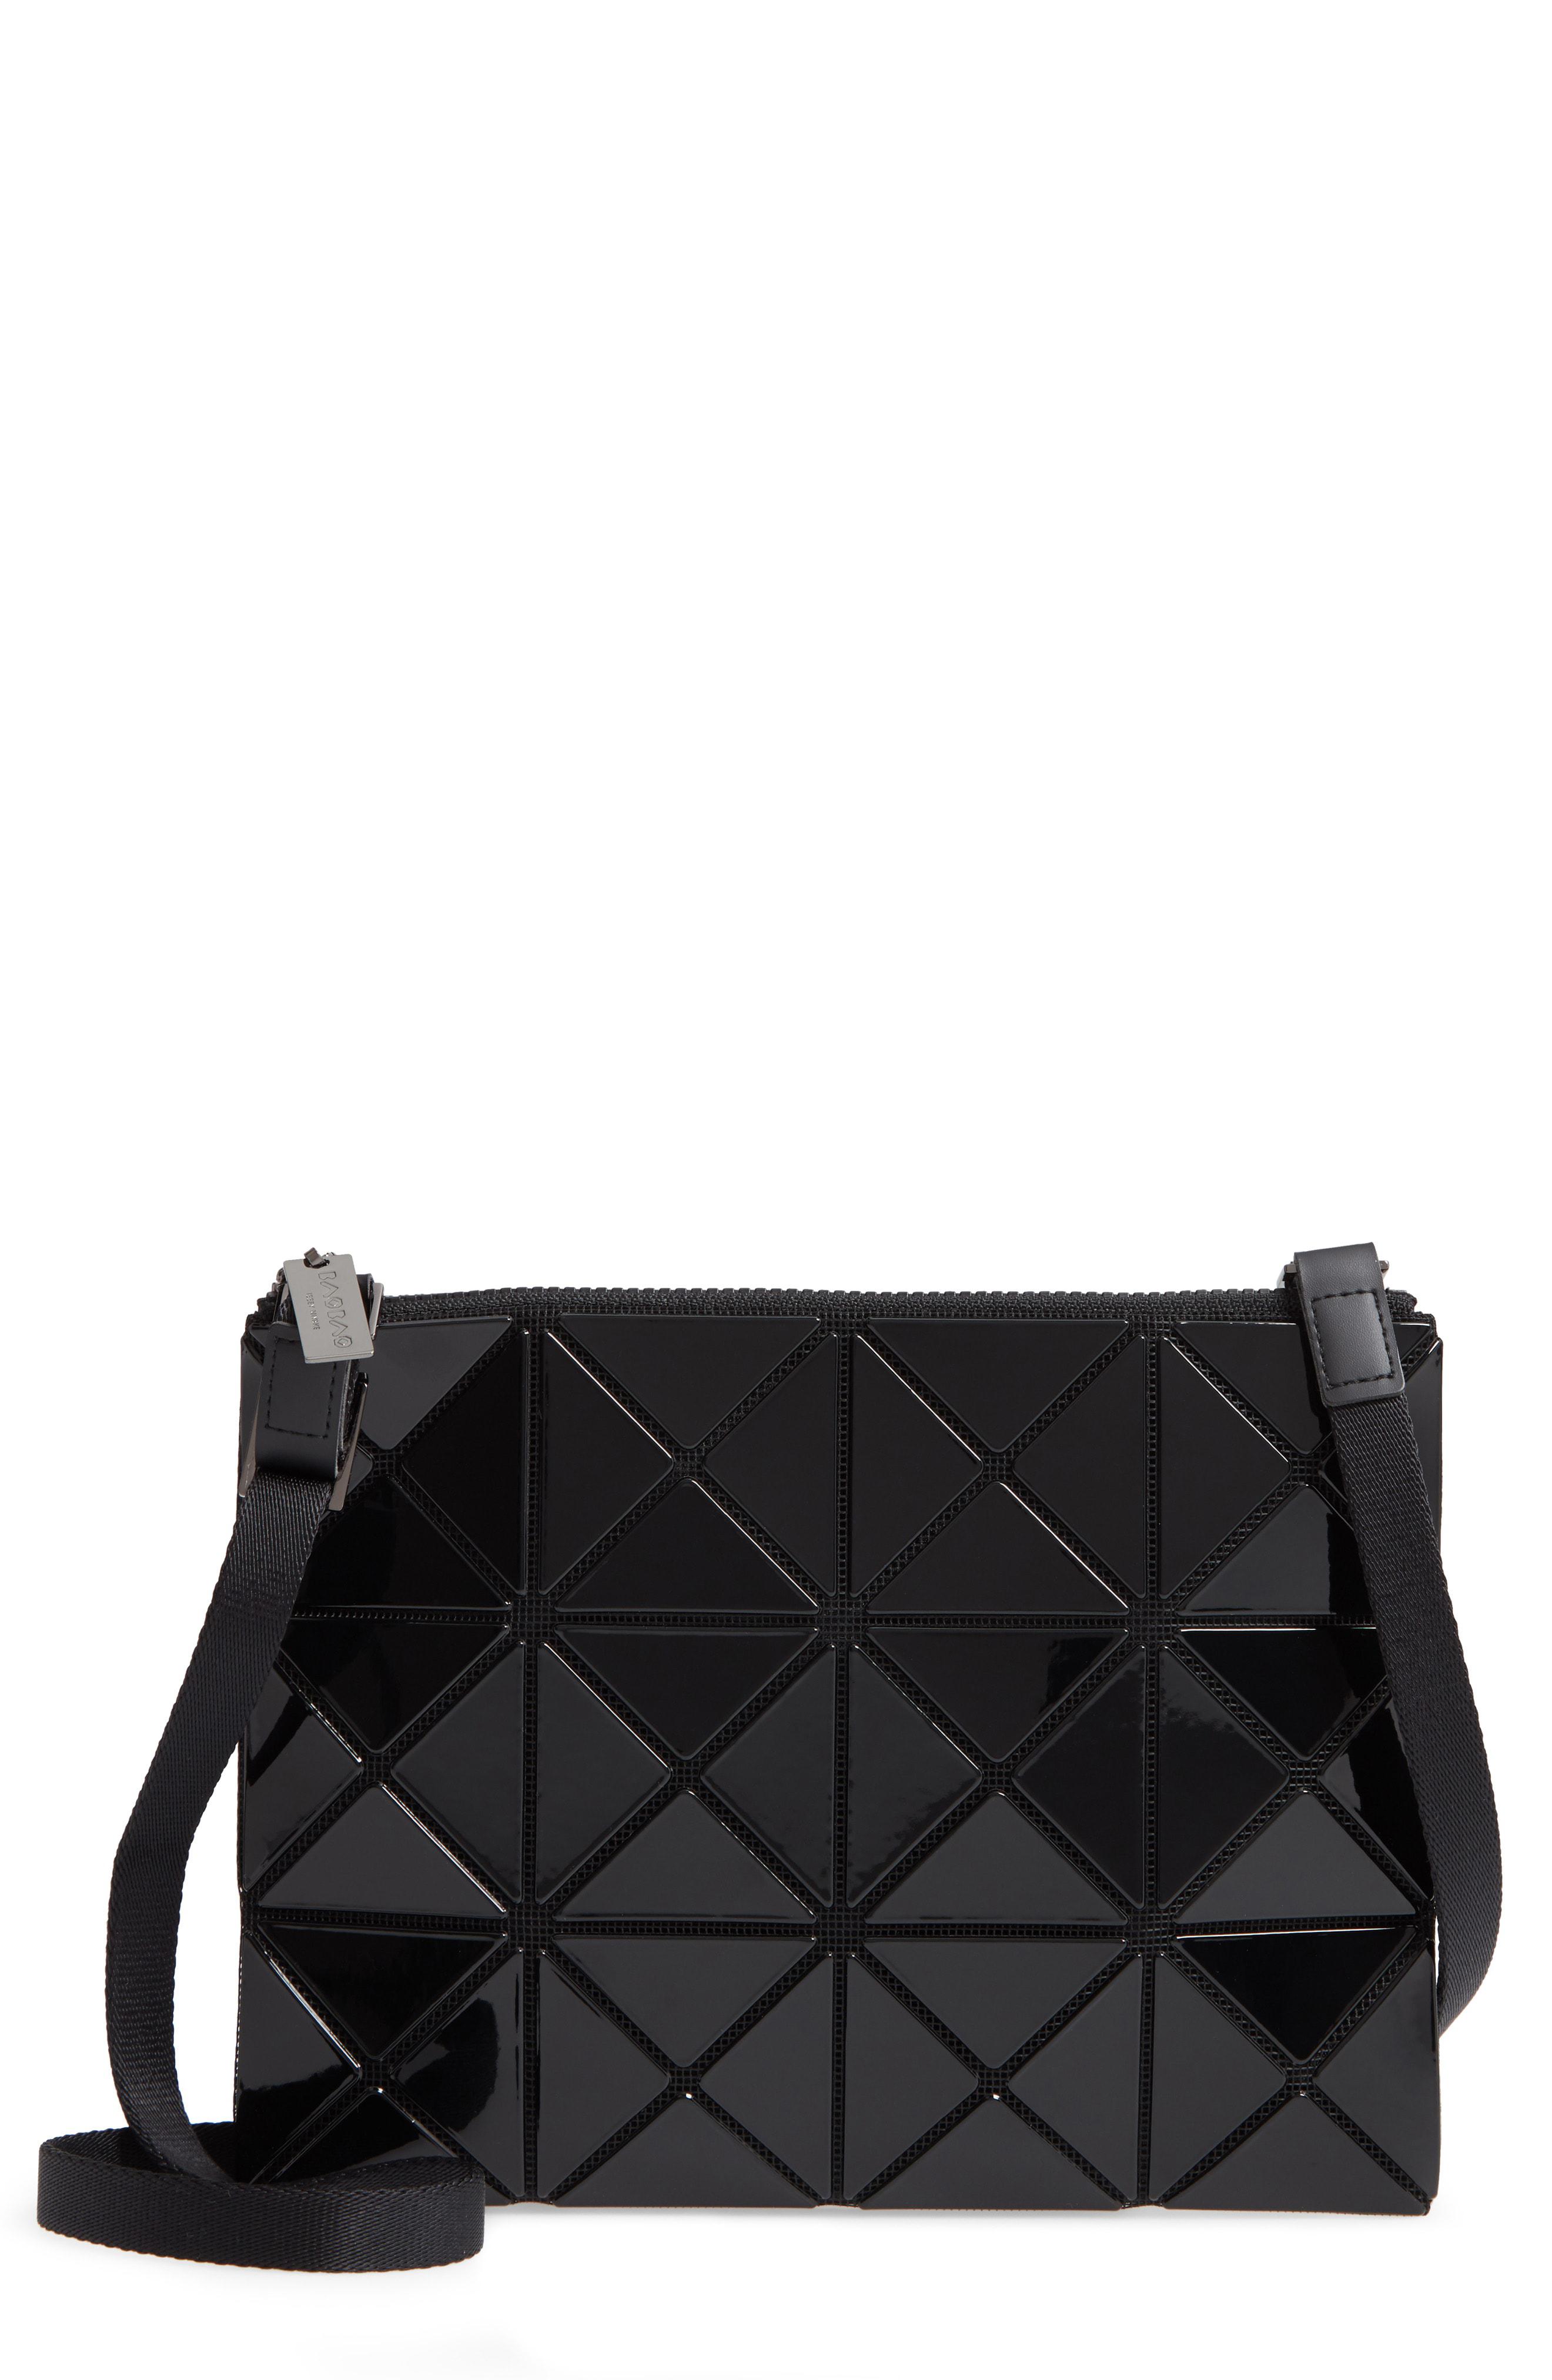 Bao Bao Issey Miyake Small Lucent Crossbody Bag In Black  21c7aa09d3d1b